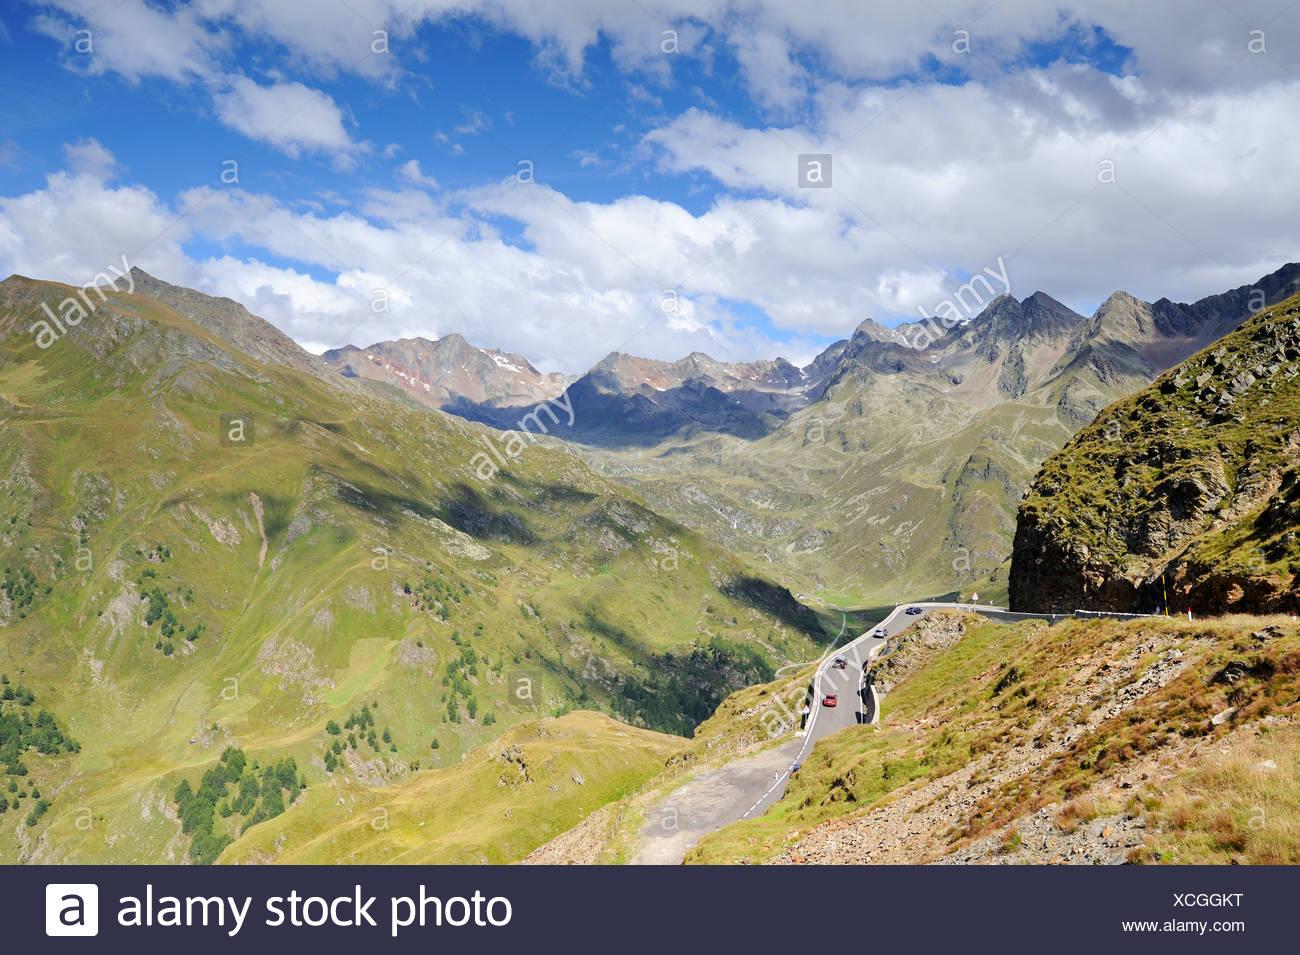 Serpentine curves of Timmelsjoch High Alpine Road, Trentino-Alto Adige, Italy, Europe - Stock Image